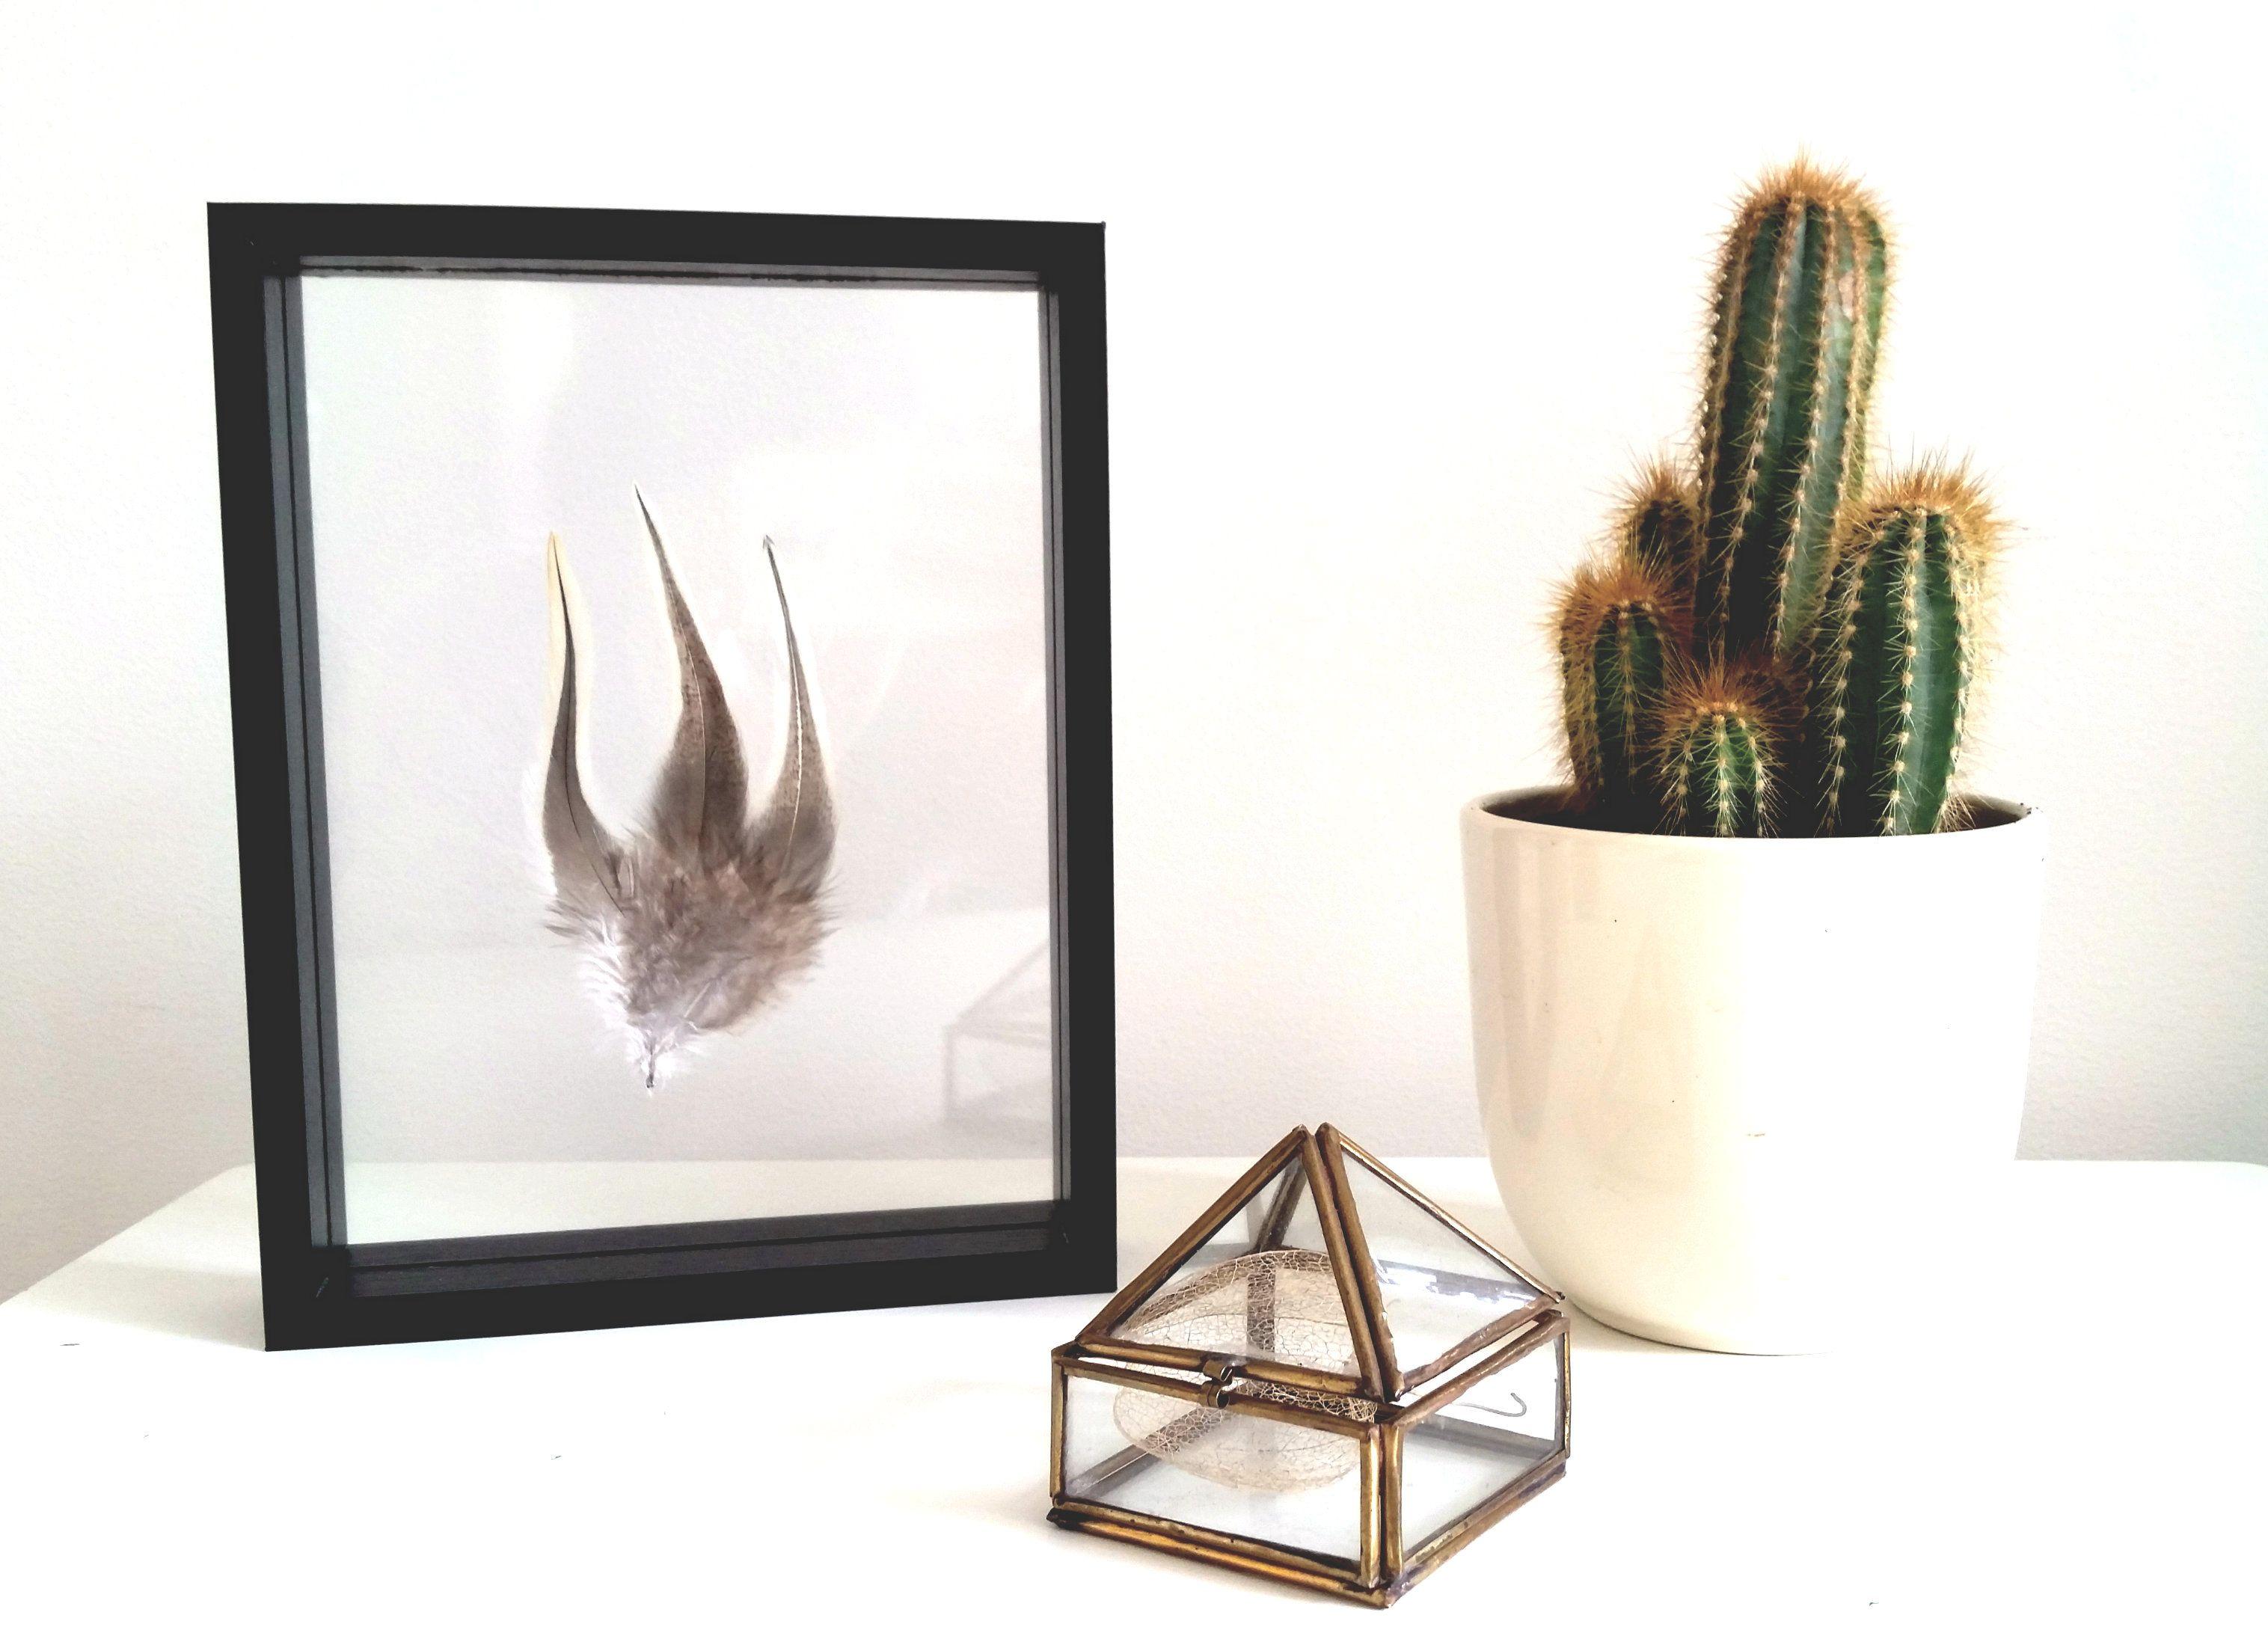 Three-in-one Badger Rooster feathers in a black floating frame ------ Drie-in-een Badger Hanenveren in zwarte zwevende lijst